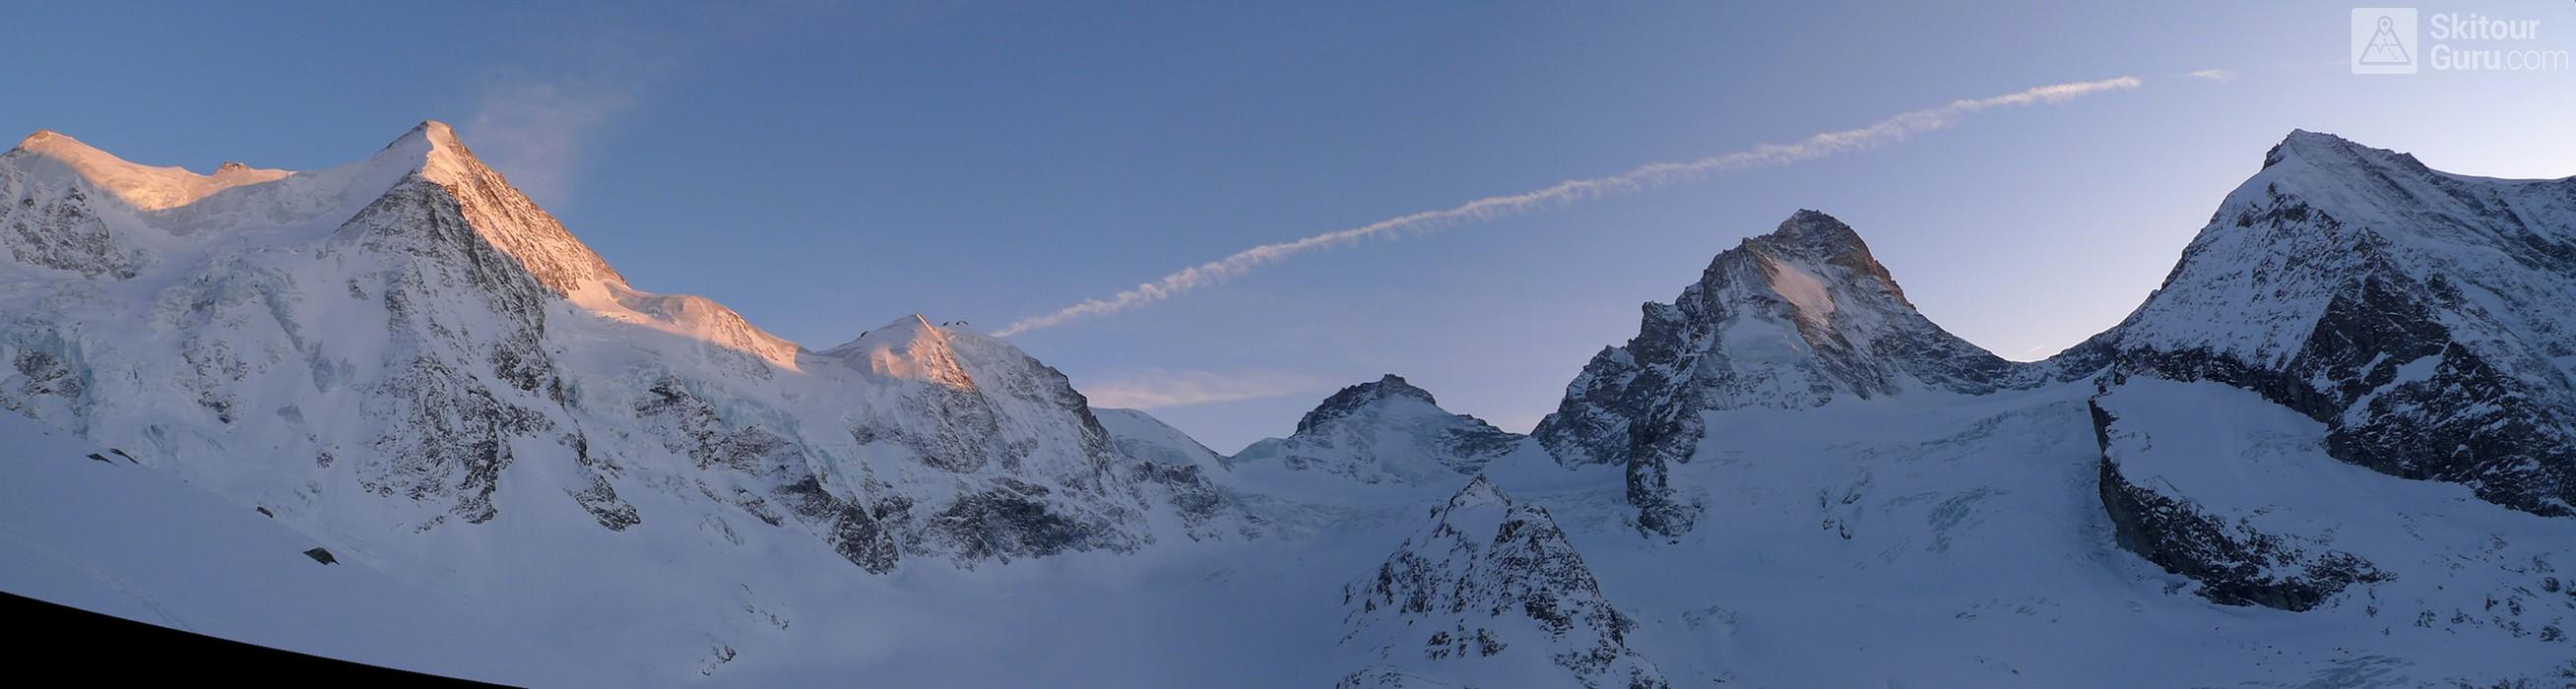 Cabane du Mountet Walliser Alpen / Alpes valaisannes Švýcarsko panorama 11